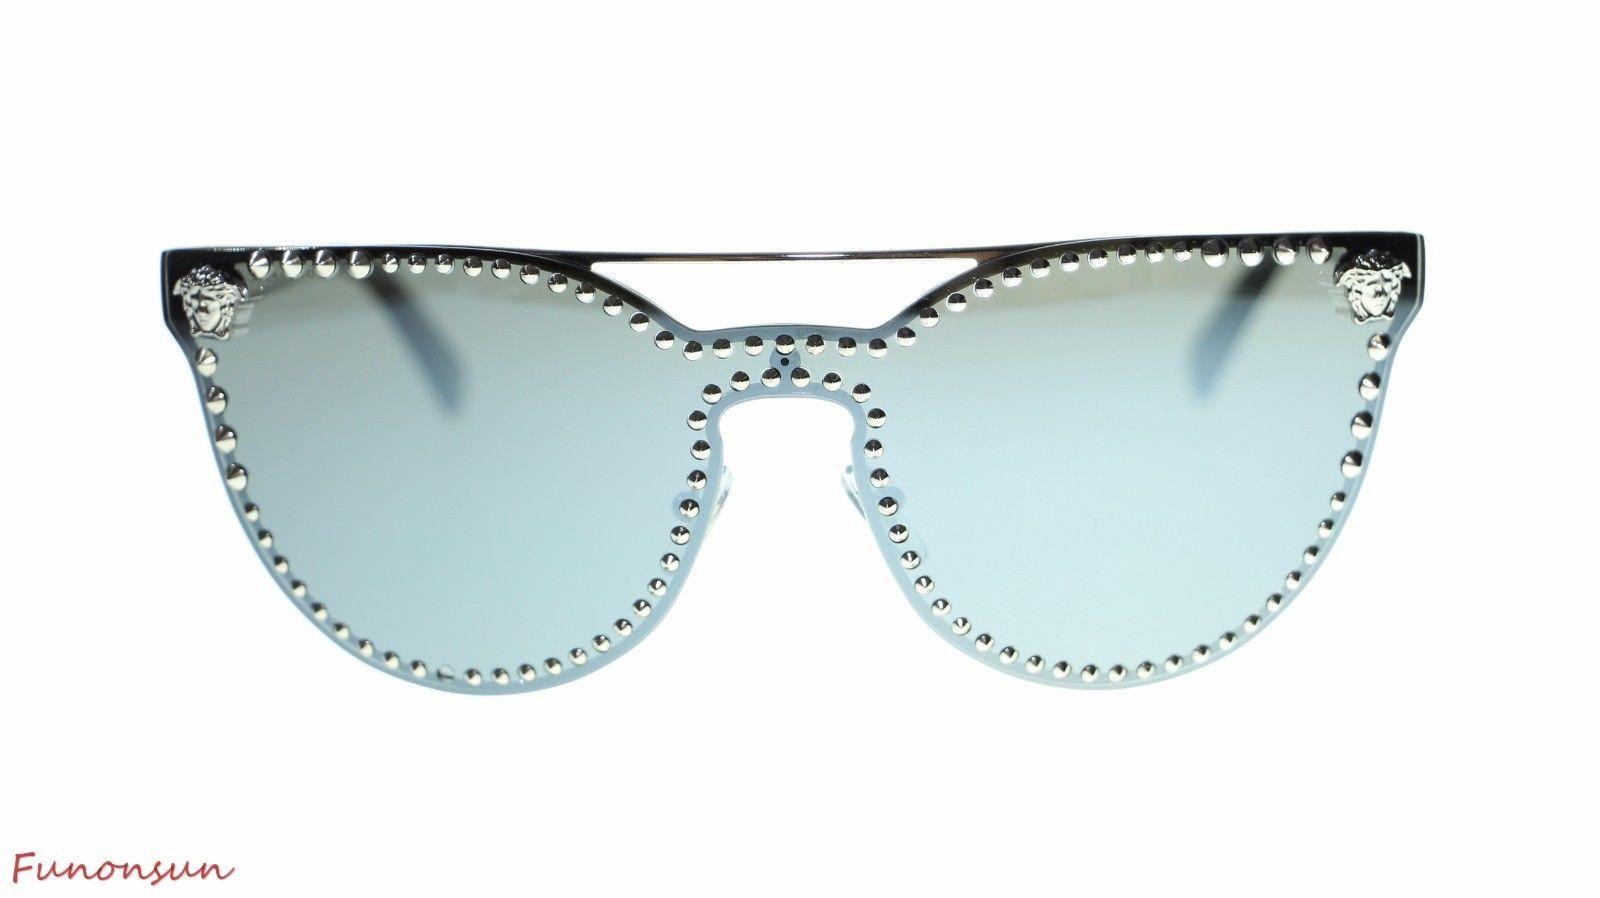 443d5e54dc5 S l1600. S l1600. Previous. Versace Cat Eye Women s Sunglasses VE2177  10006G Silver Grey Mirror Lens 45mm